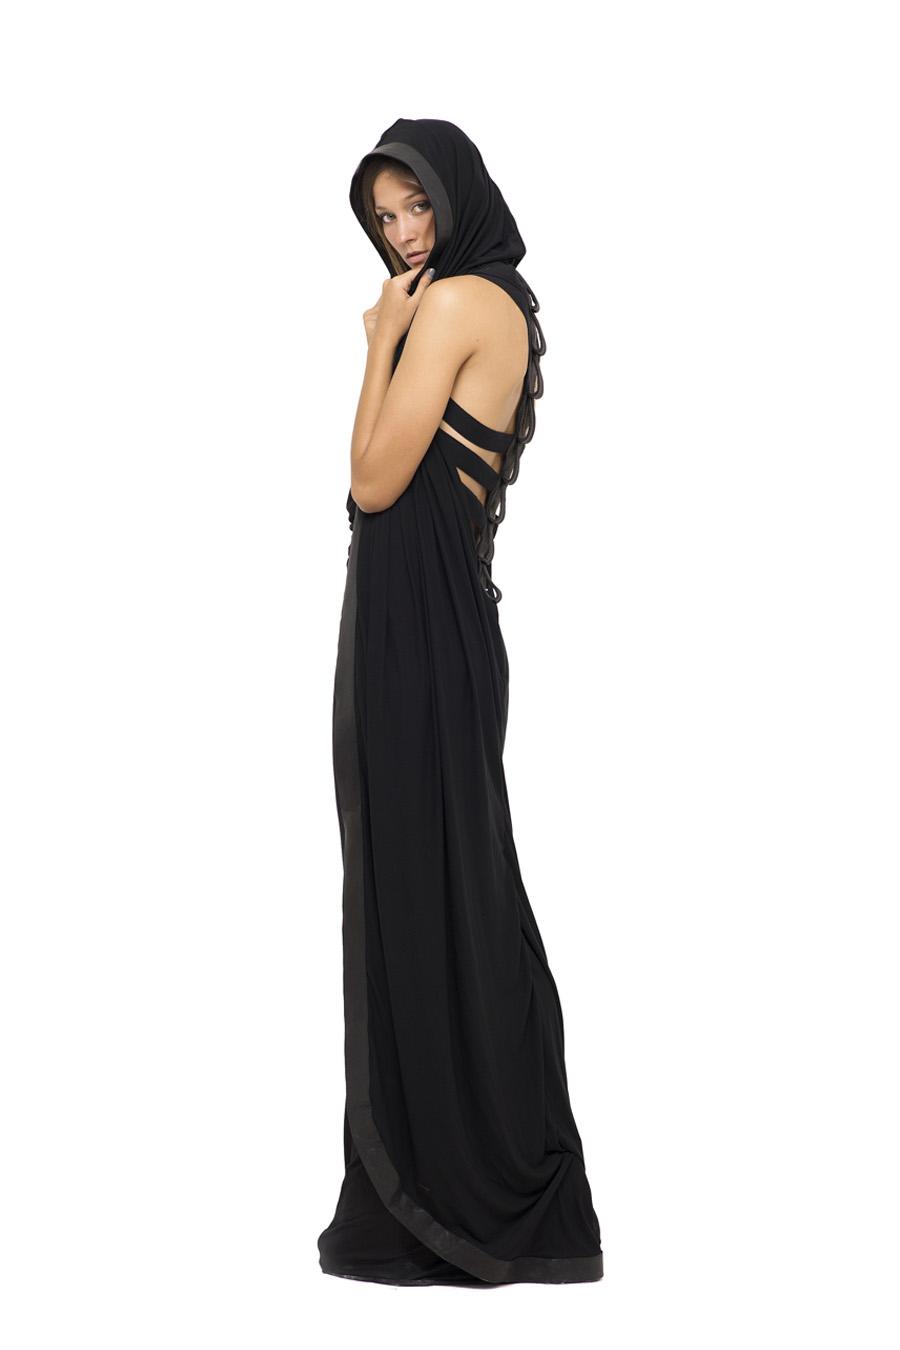 morphic dress 2.jpg